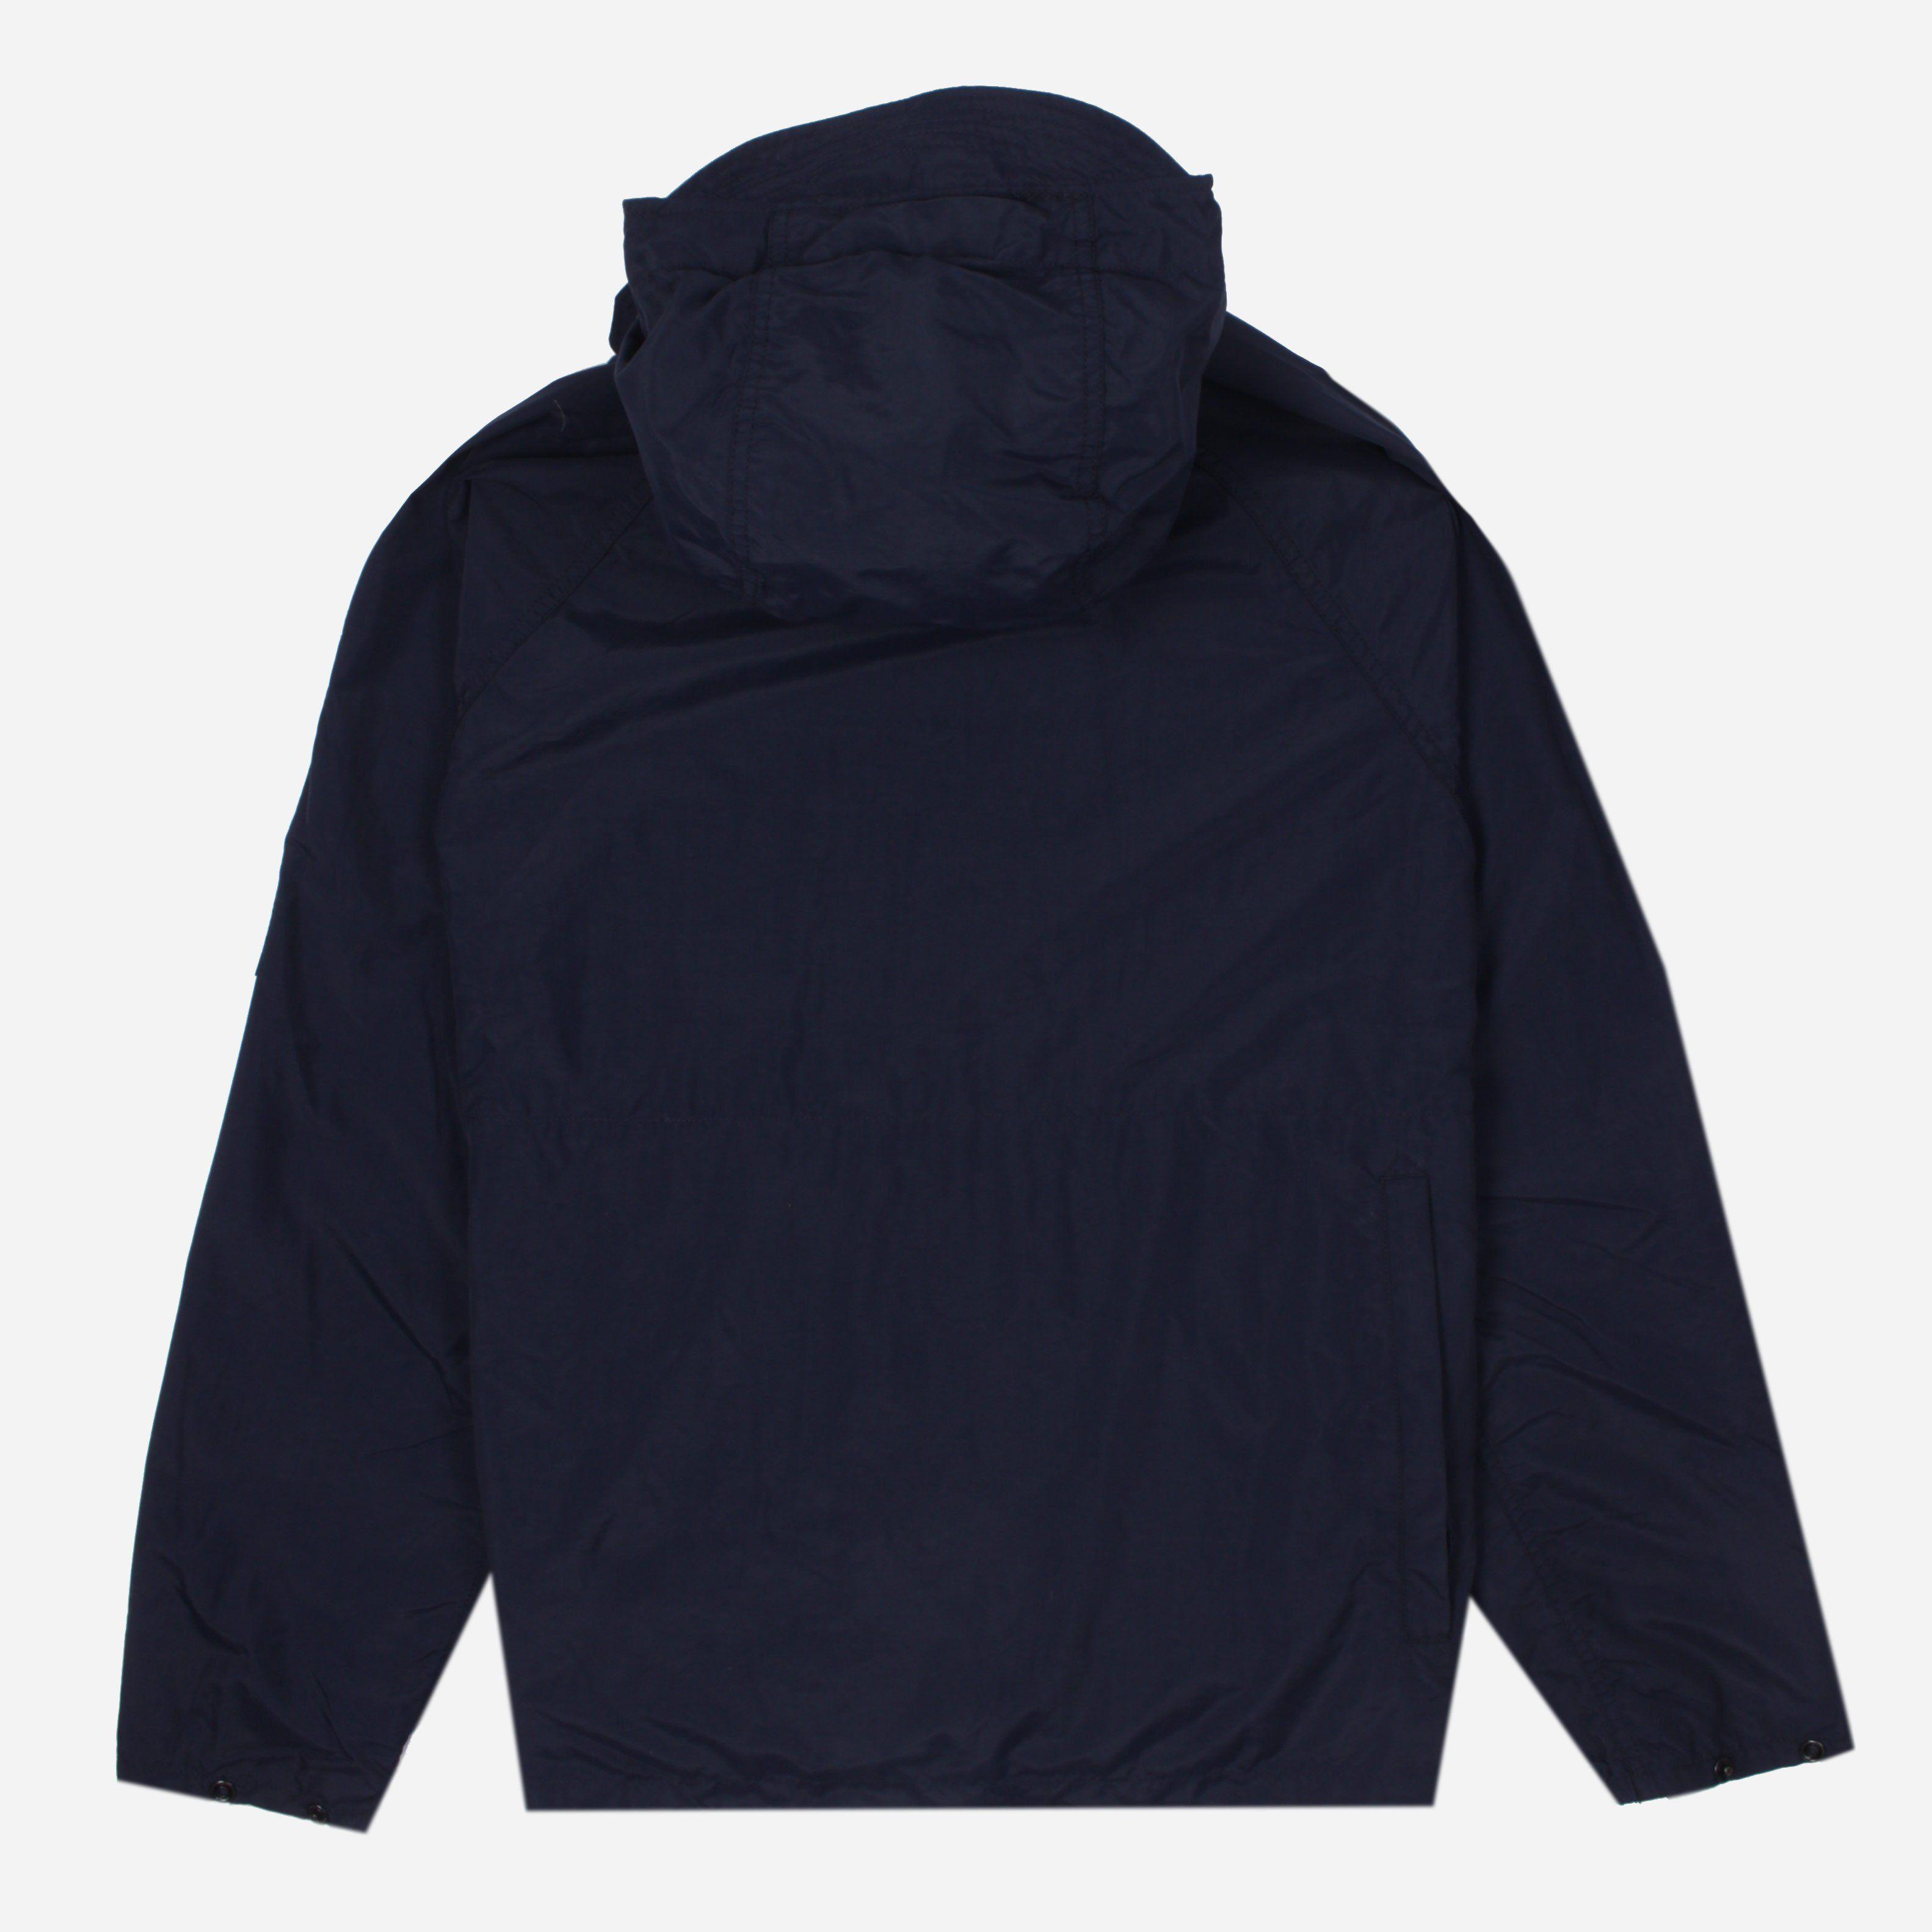 Engineered Garments Atlantic Parka Jacket